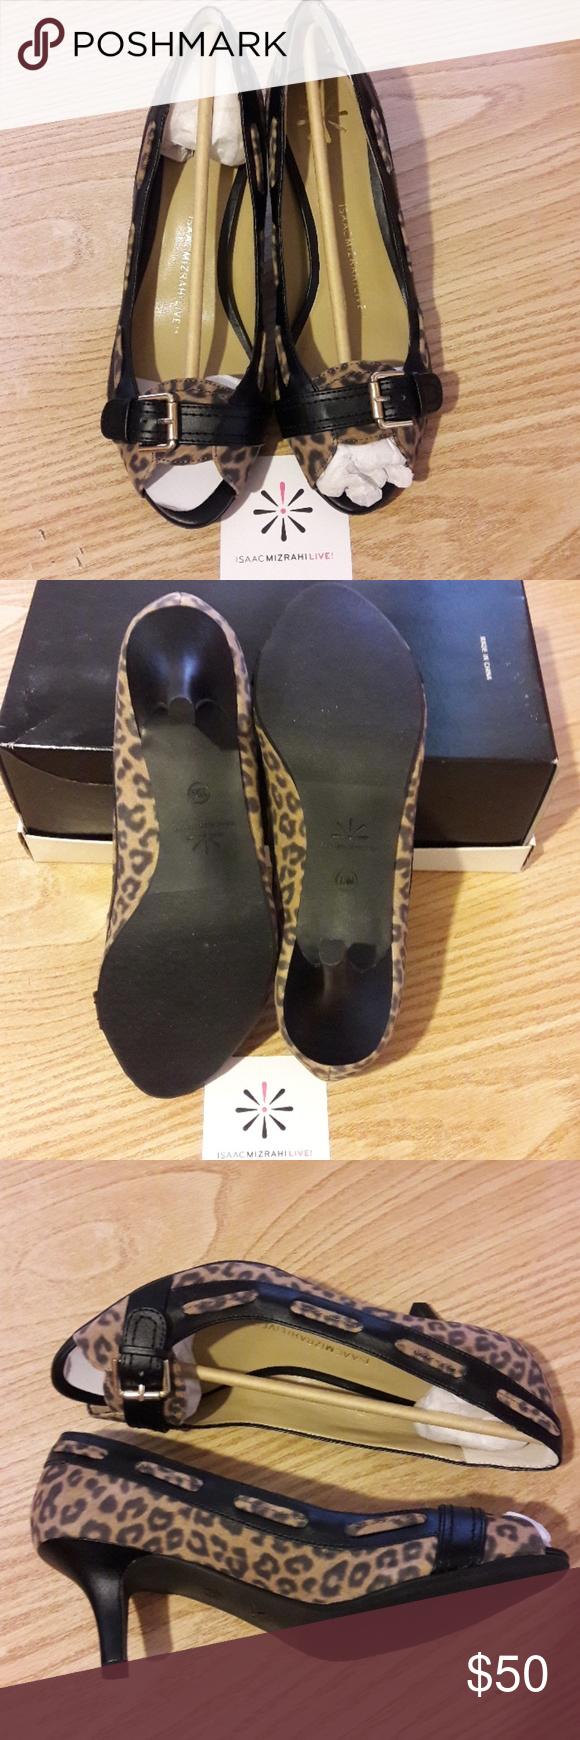 cc62d1d86304 Isaac Mizrahi Live Suede peep toe kitten Heels Leopard print NWOT size 7 1/2